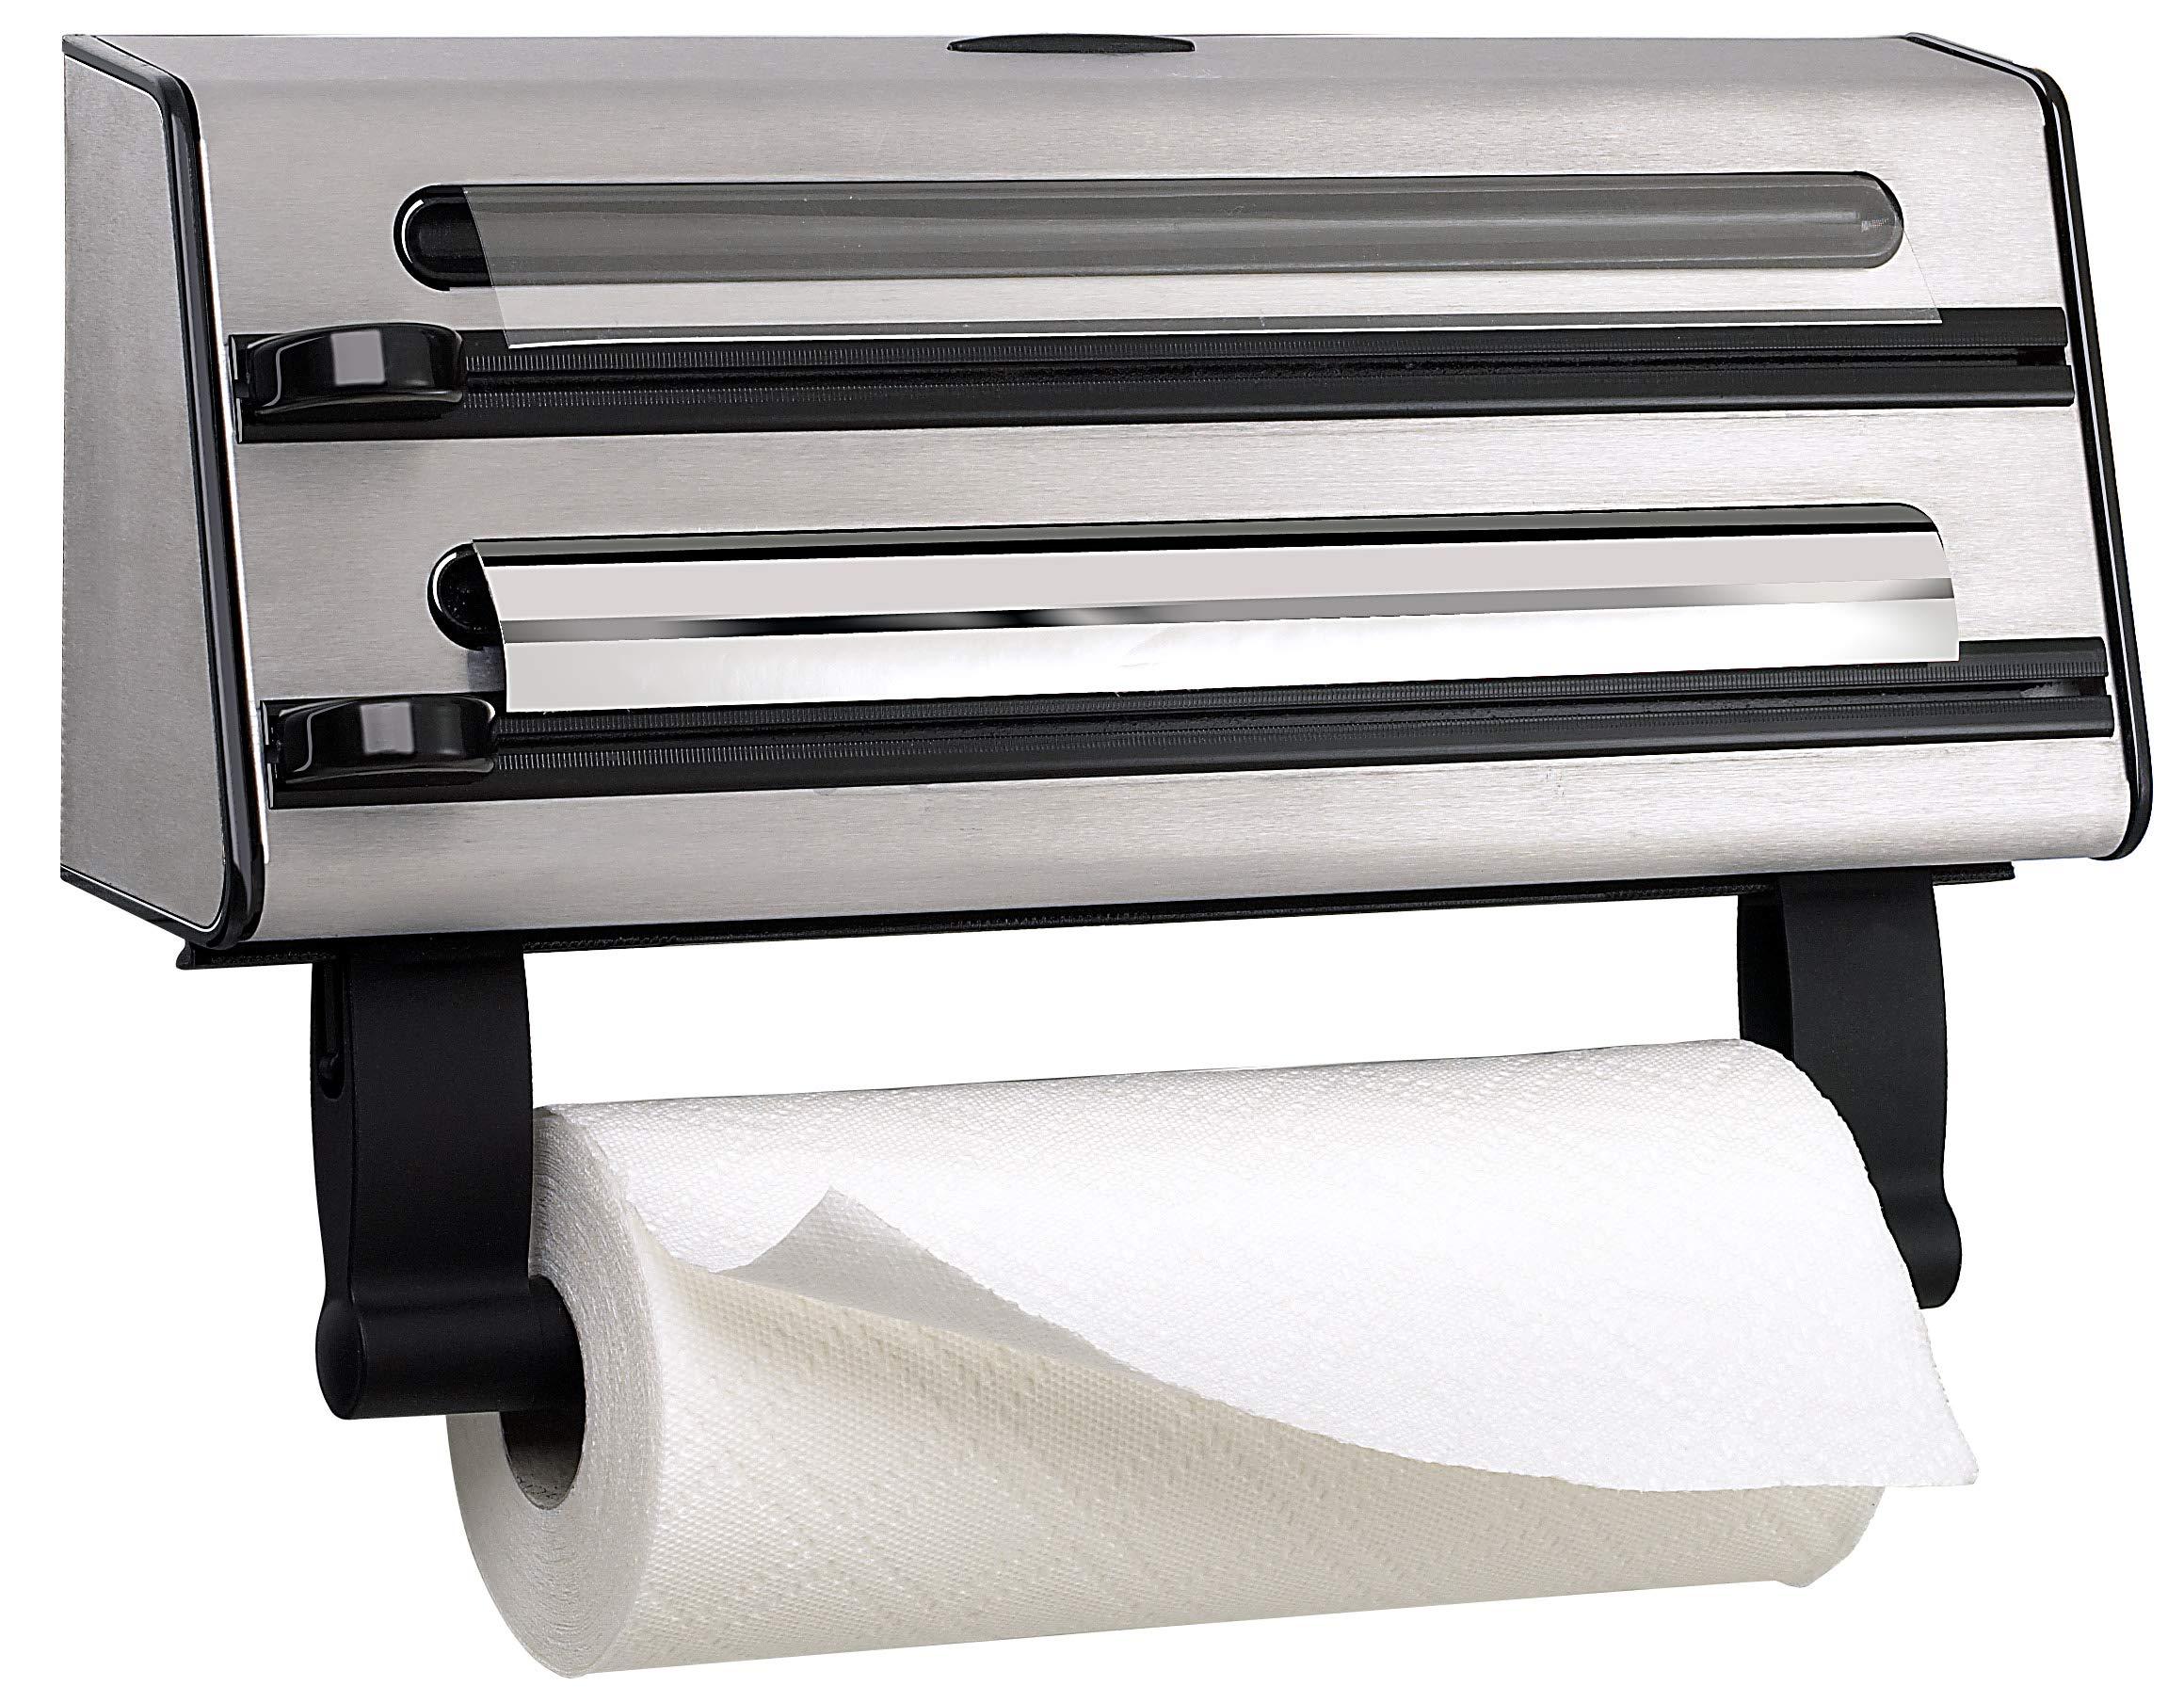 Emsa Triple Roll Dispenser''Contura'' of Stainless Steel, Silver/Black